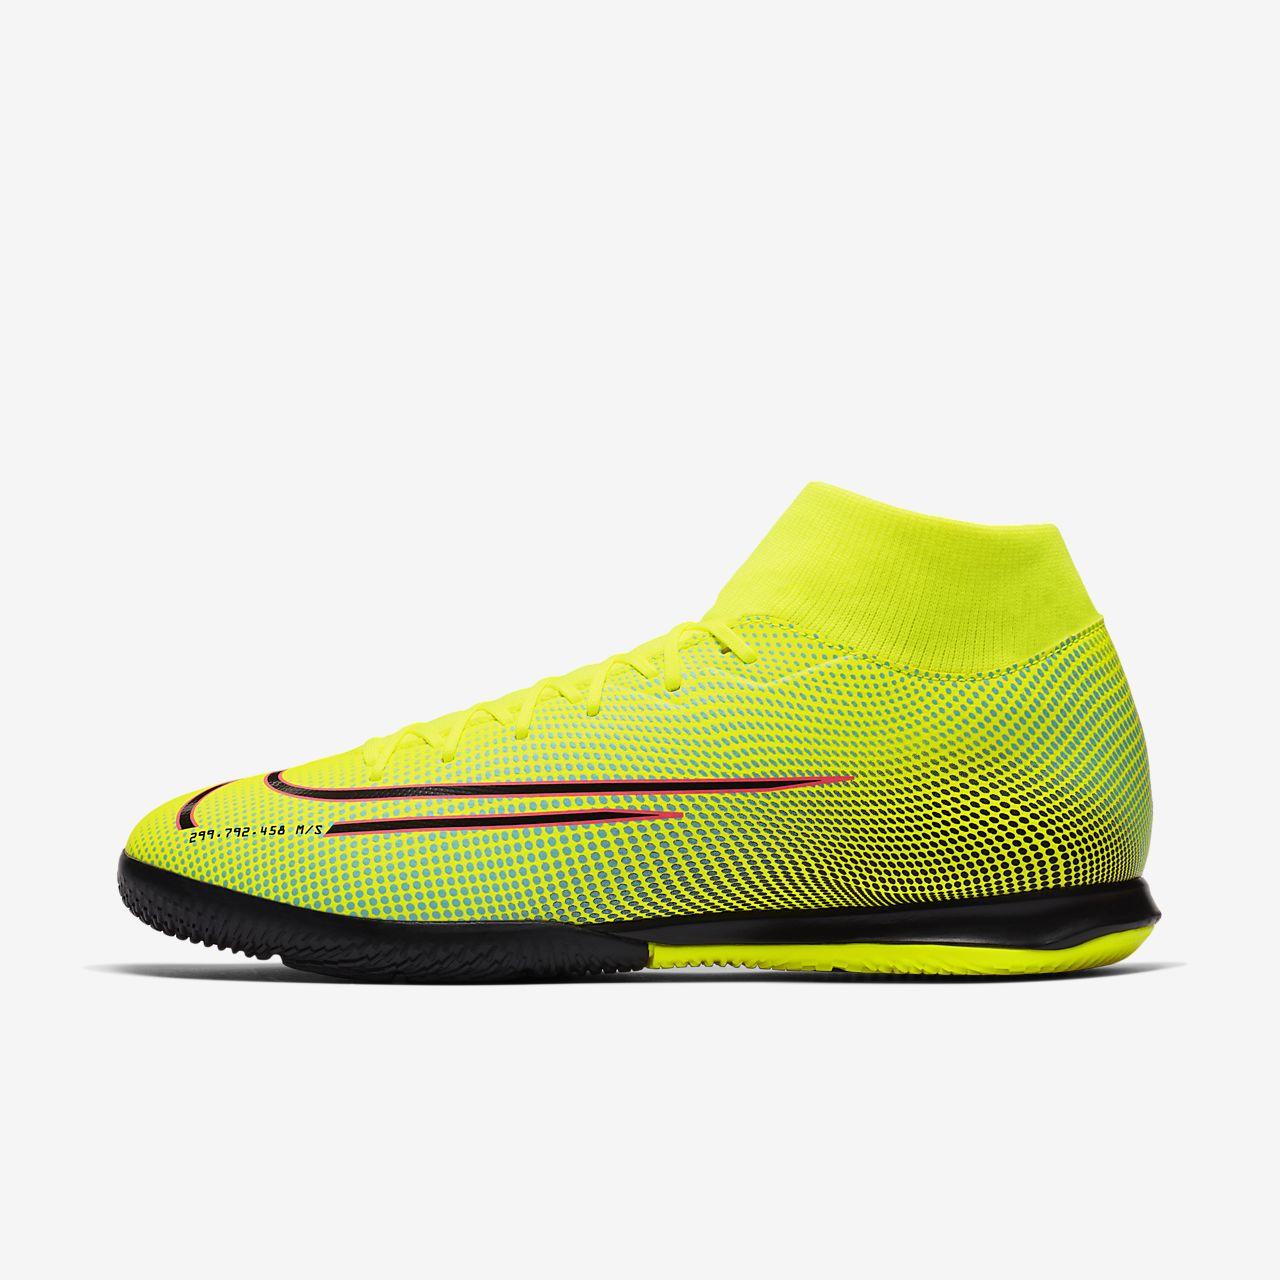 Scarpa da calcio per campi indoor Nike Jr. Mercurial Superfly 7 Academy IC Bambini